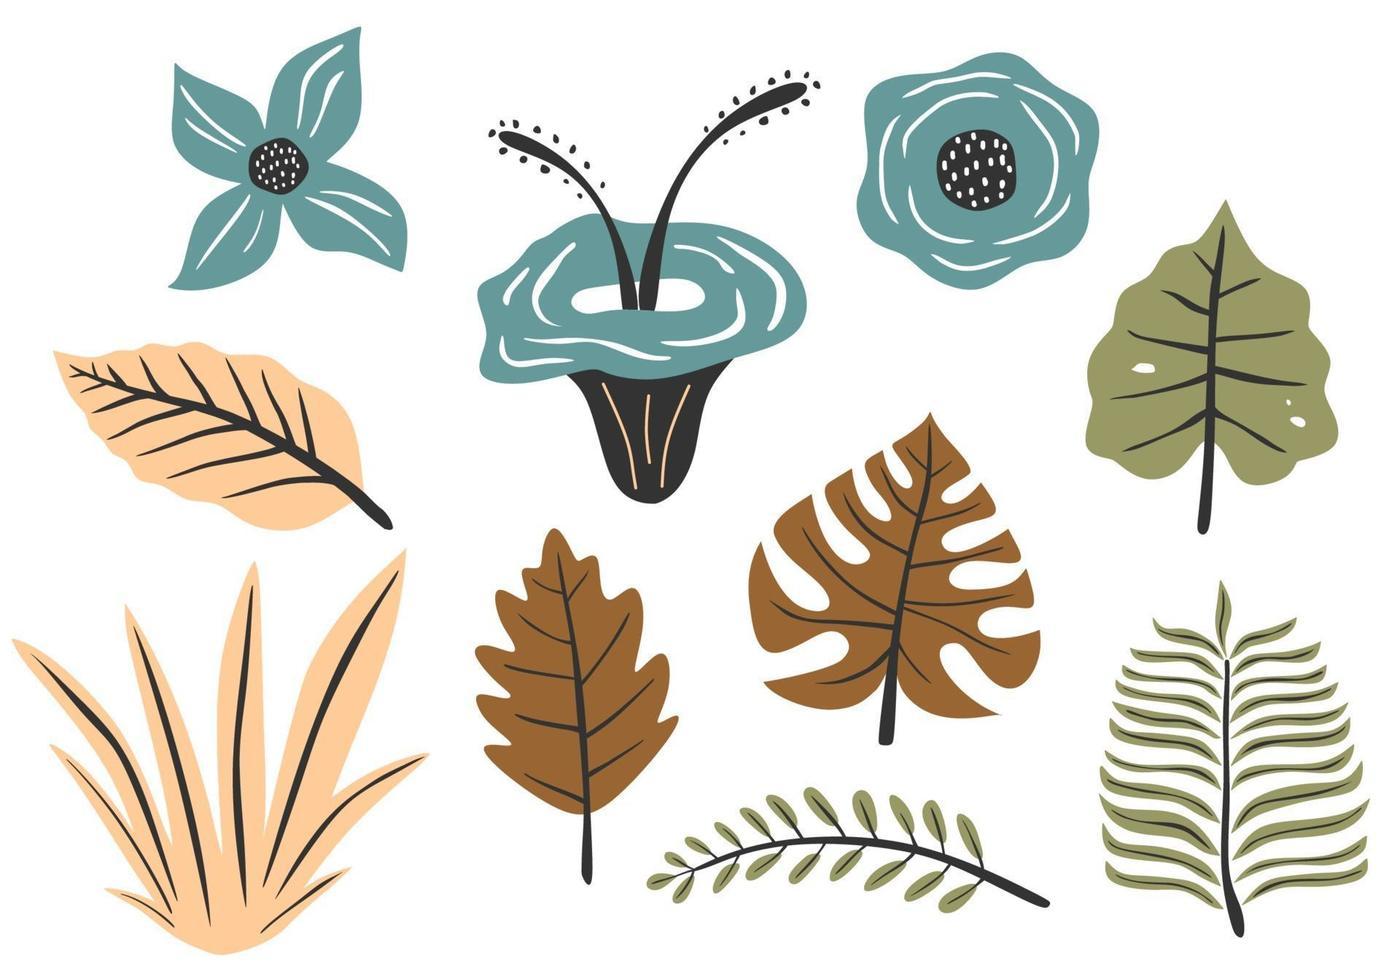 flores e folhas coloridas, textura de floresta vetor